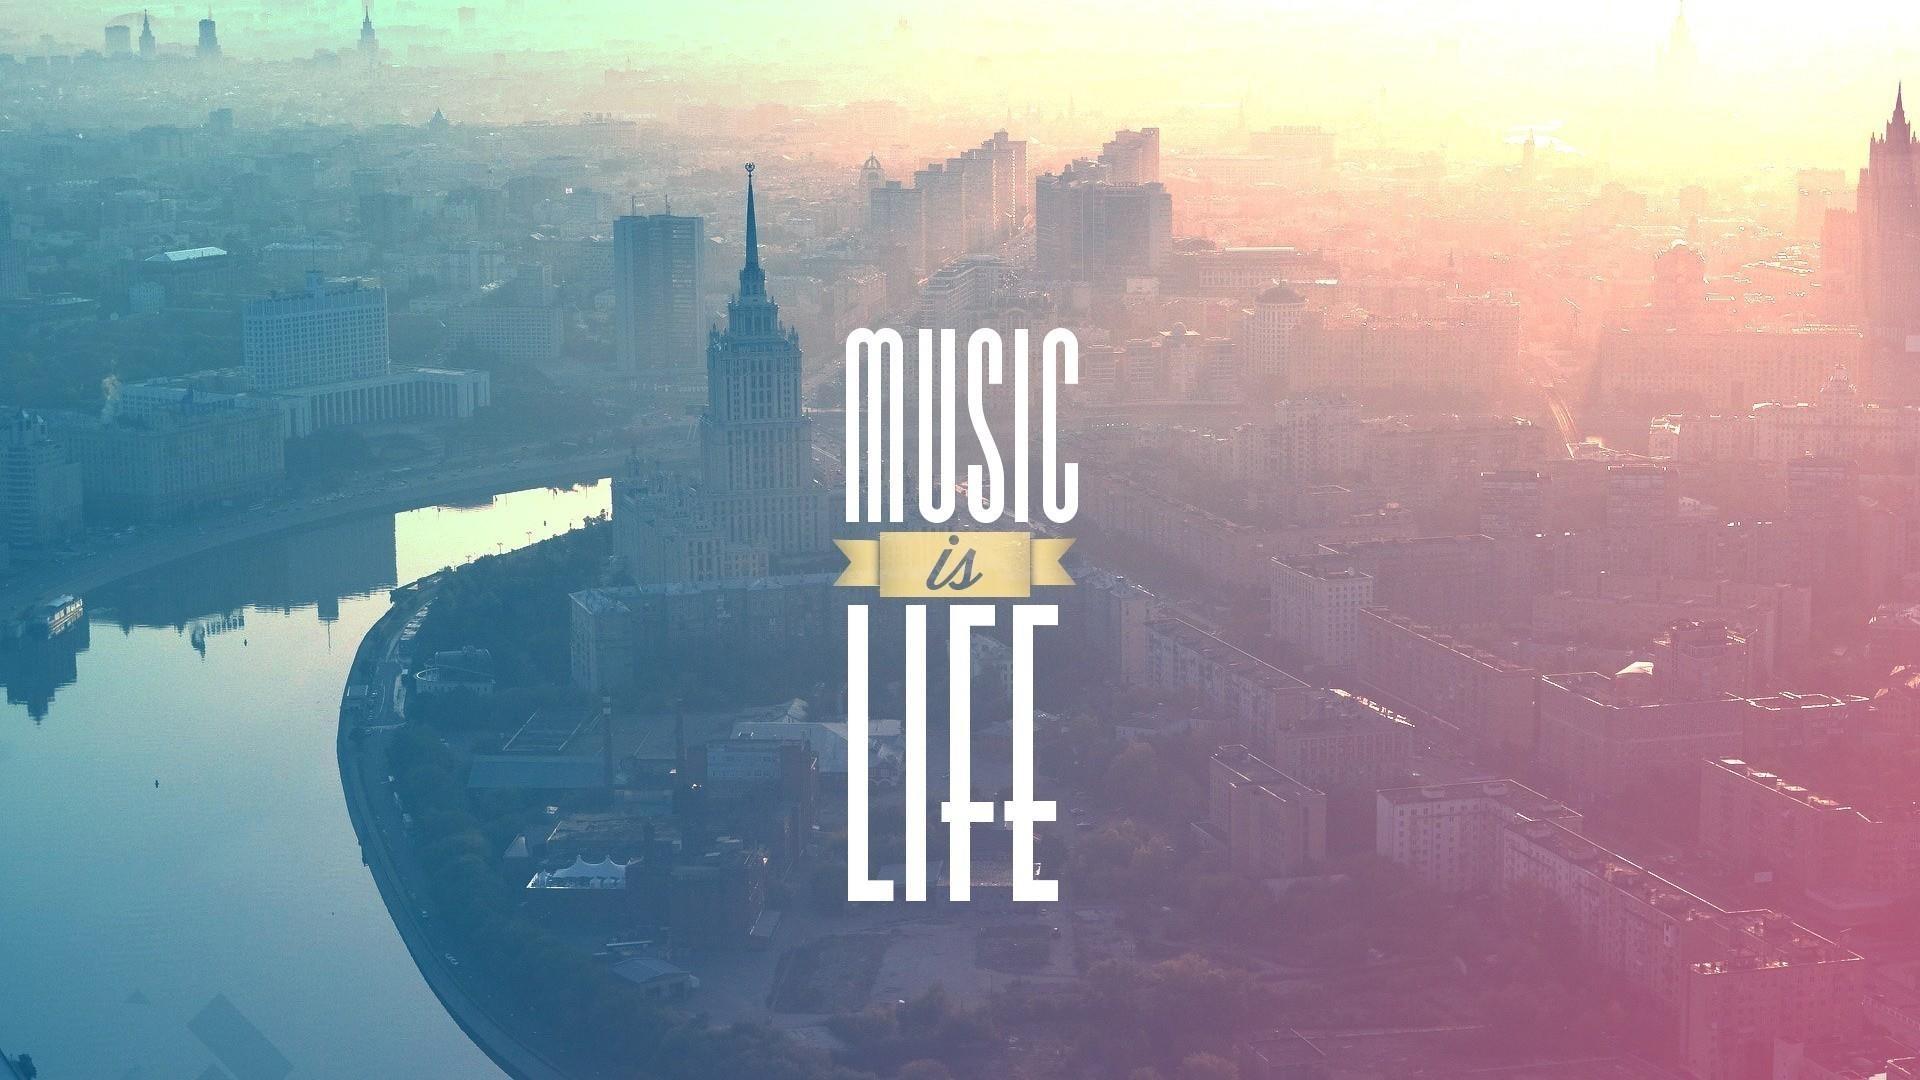 music is life wallpaper | wallpaper studio 10 | tens of thousands hd